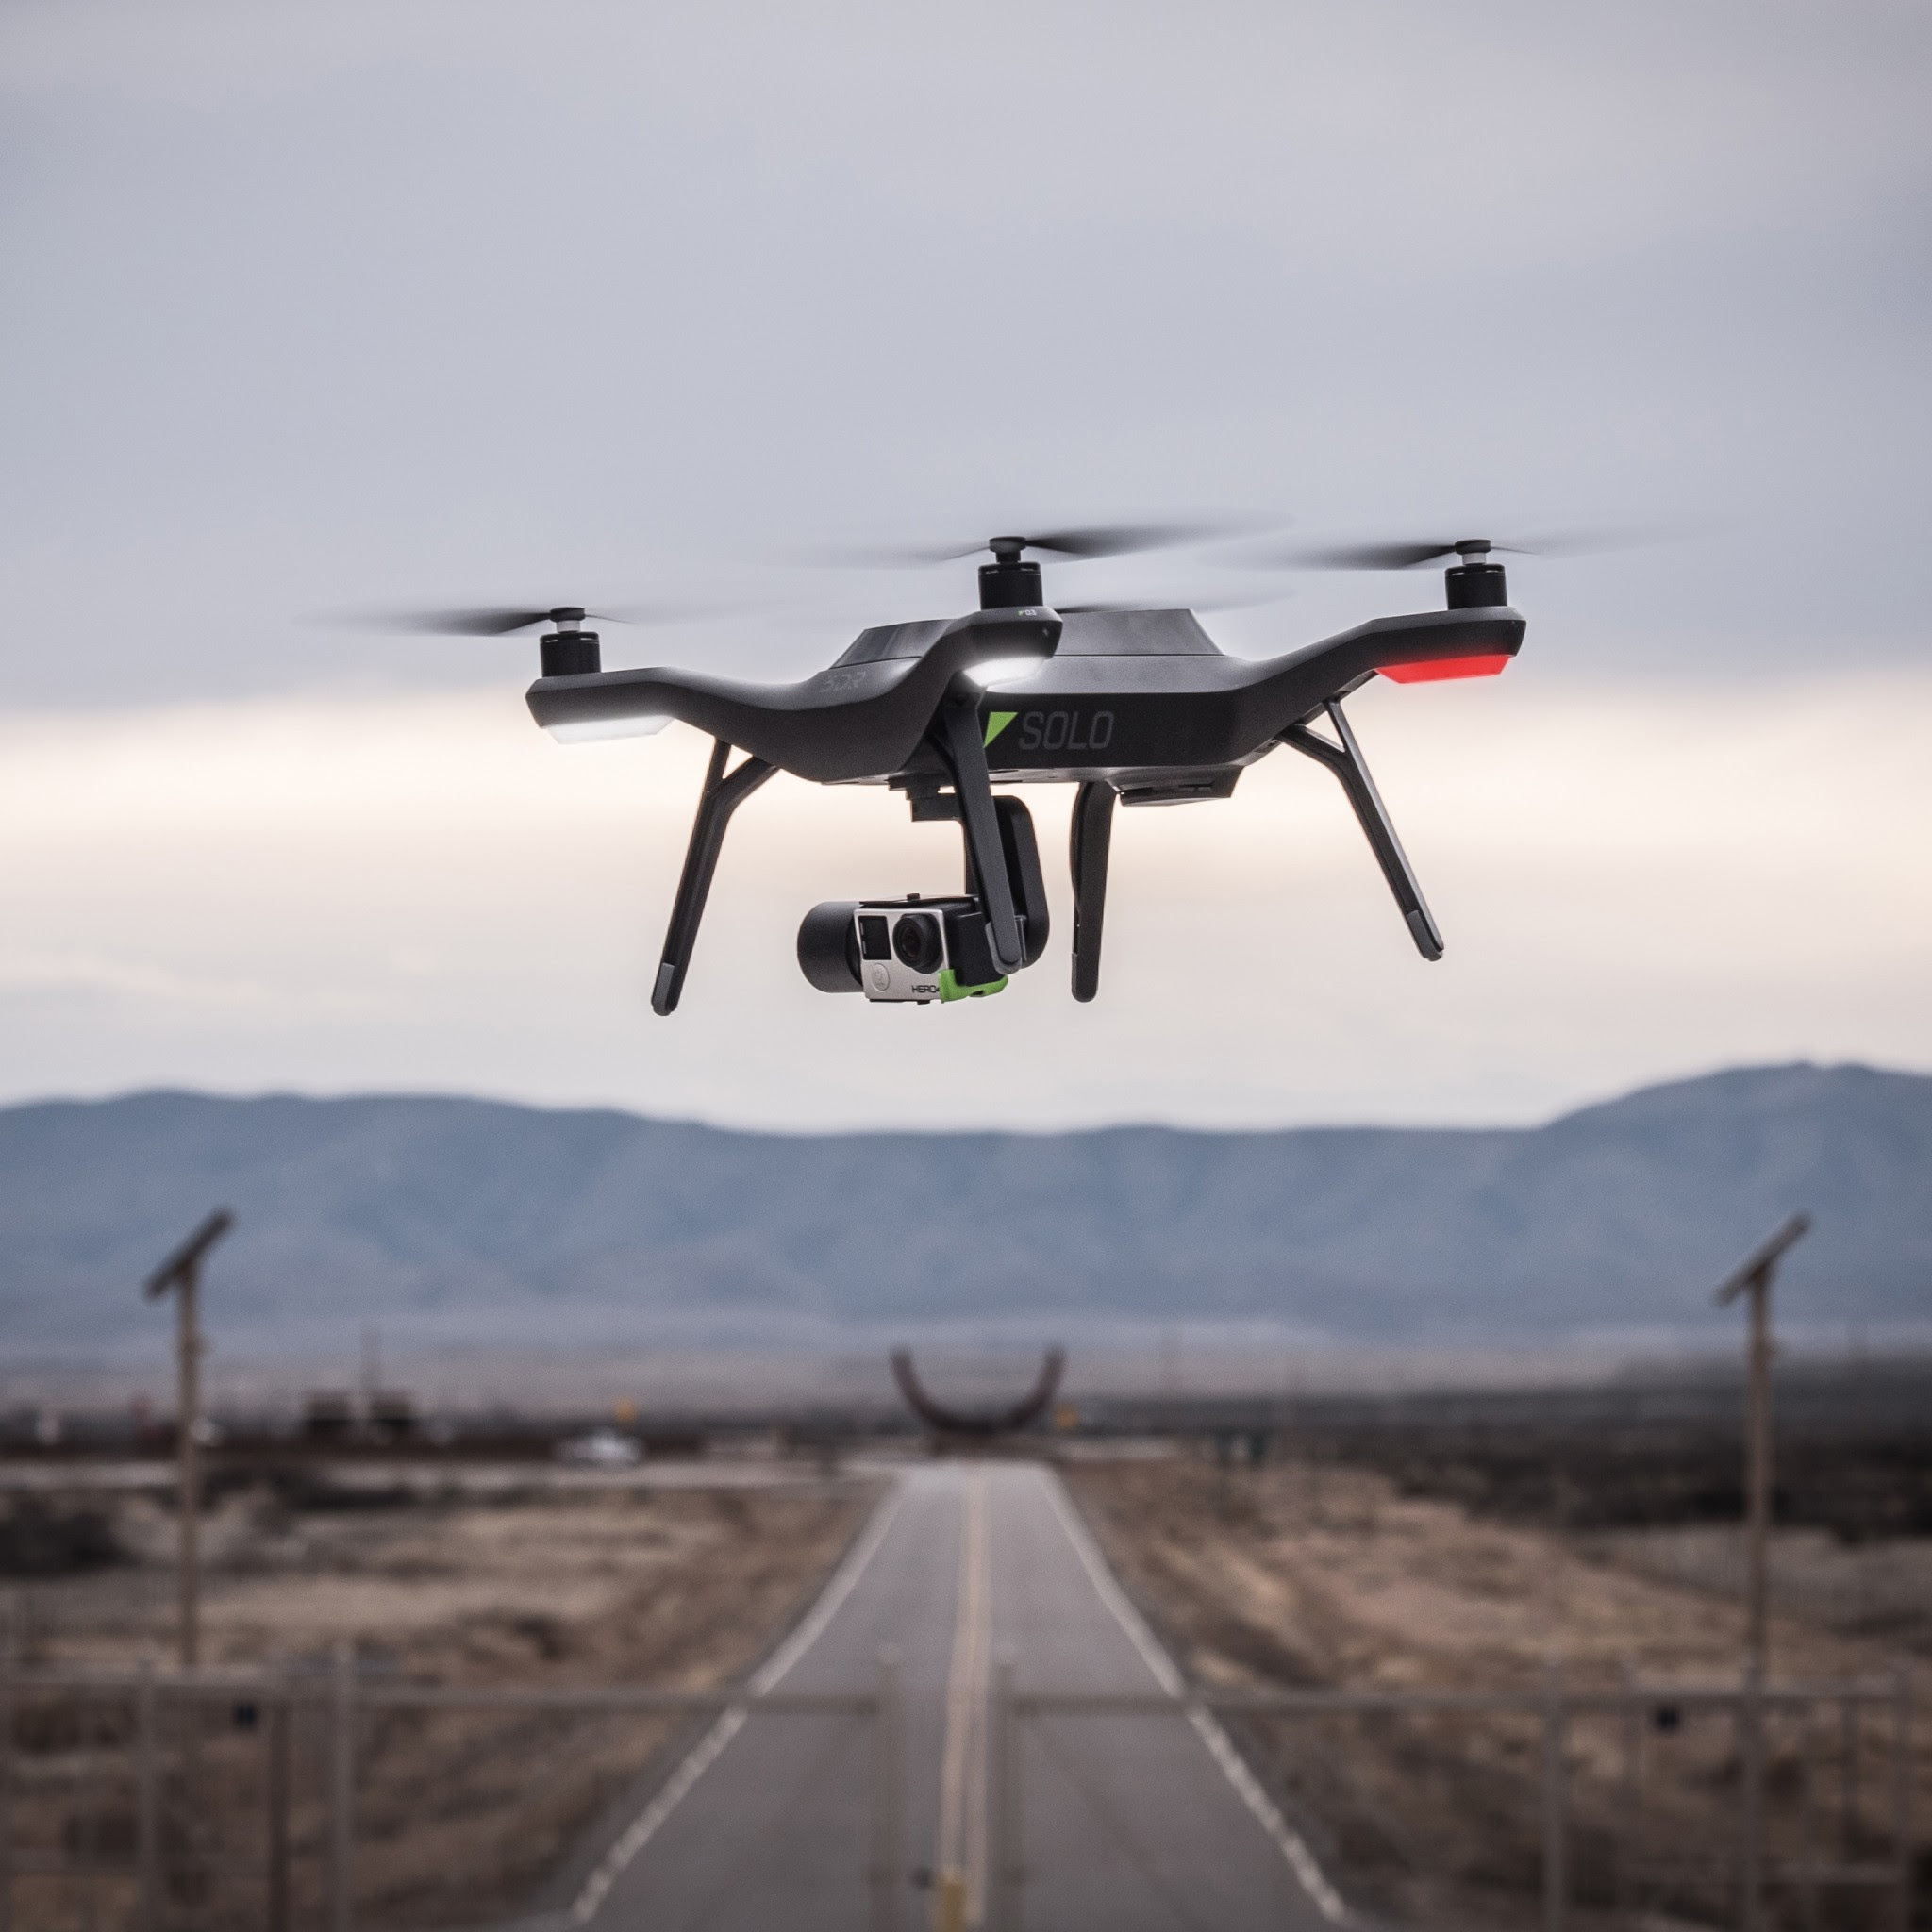 dji phantom 3 drone vs 3d robotics solo drone comparison story